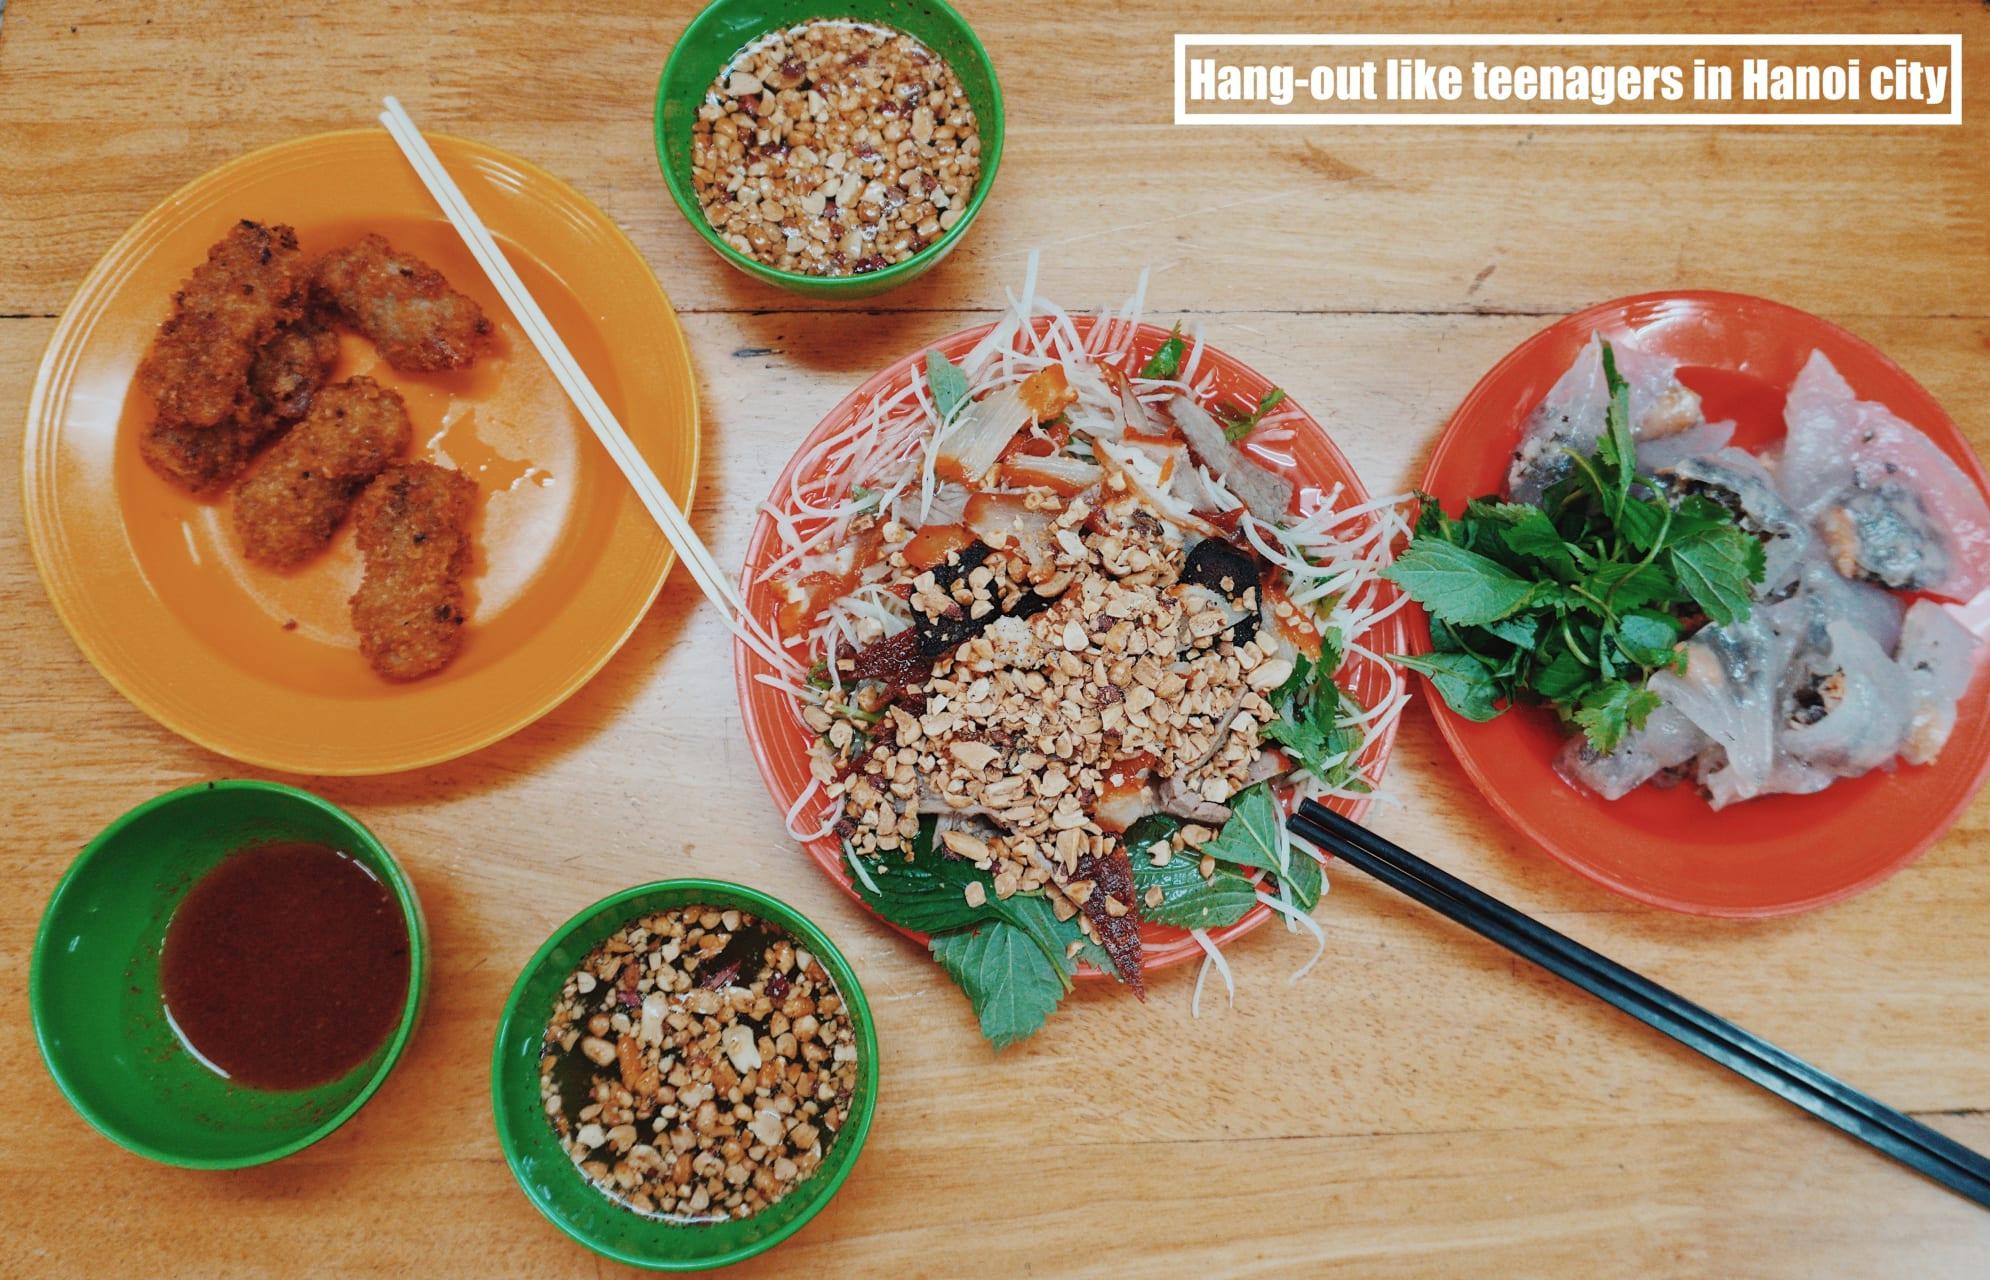 Hanoi - Hang-out like Teenager in Hanoi city